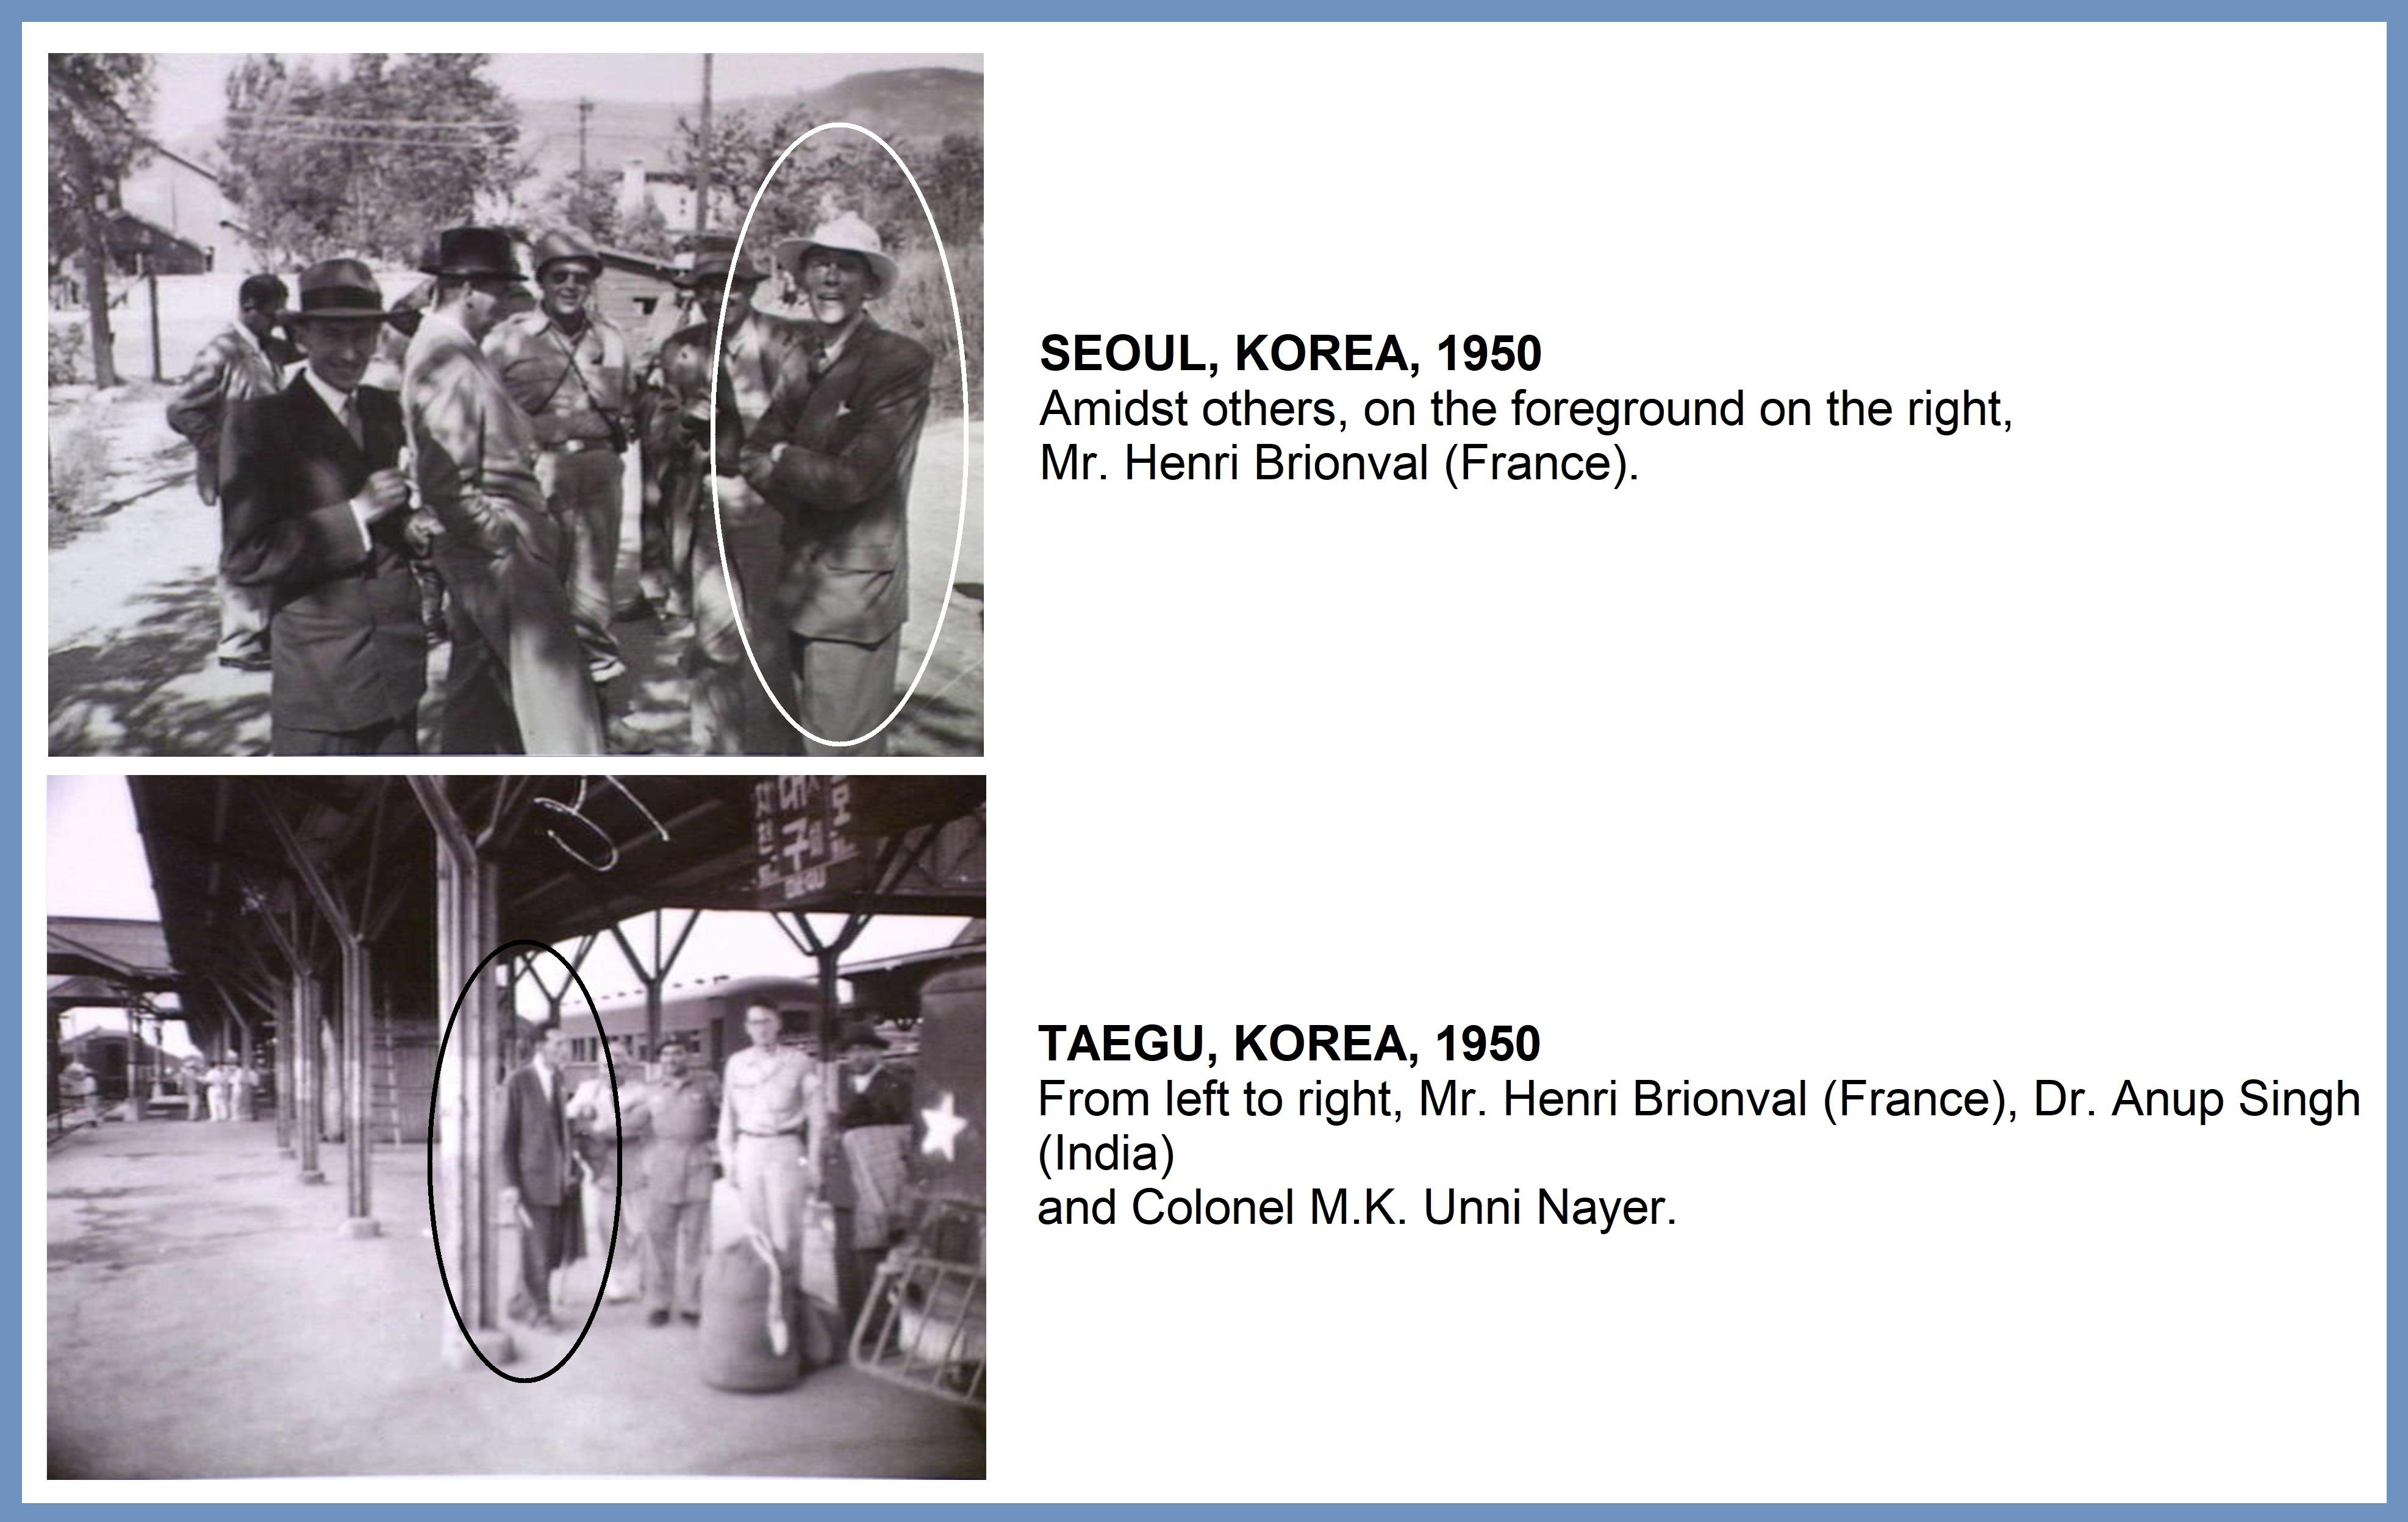 A CONICAL SHAPED CELADON GLAZED STONEWARE BOWL Korea, Joseon Dynasty H: 5cm - D: 13.3cm - Image 2 of 8